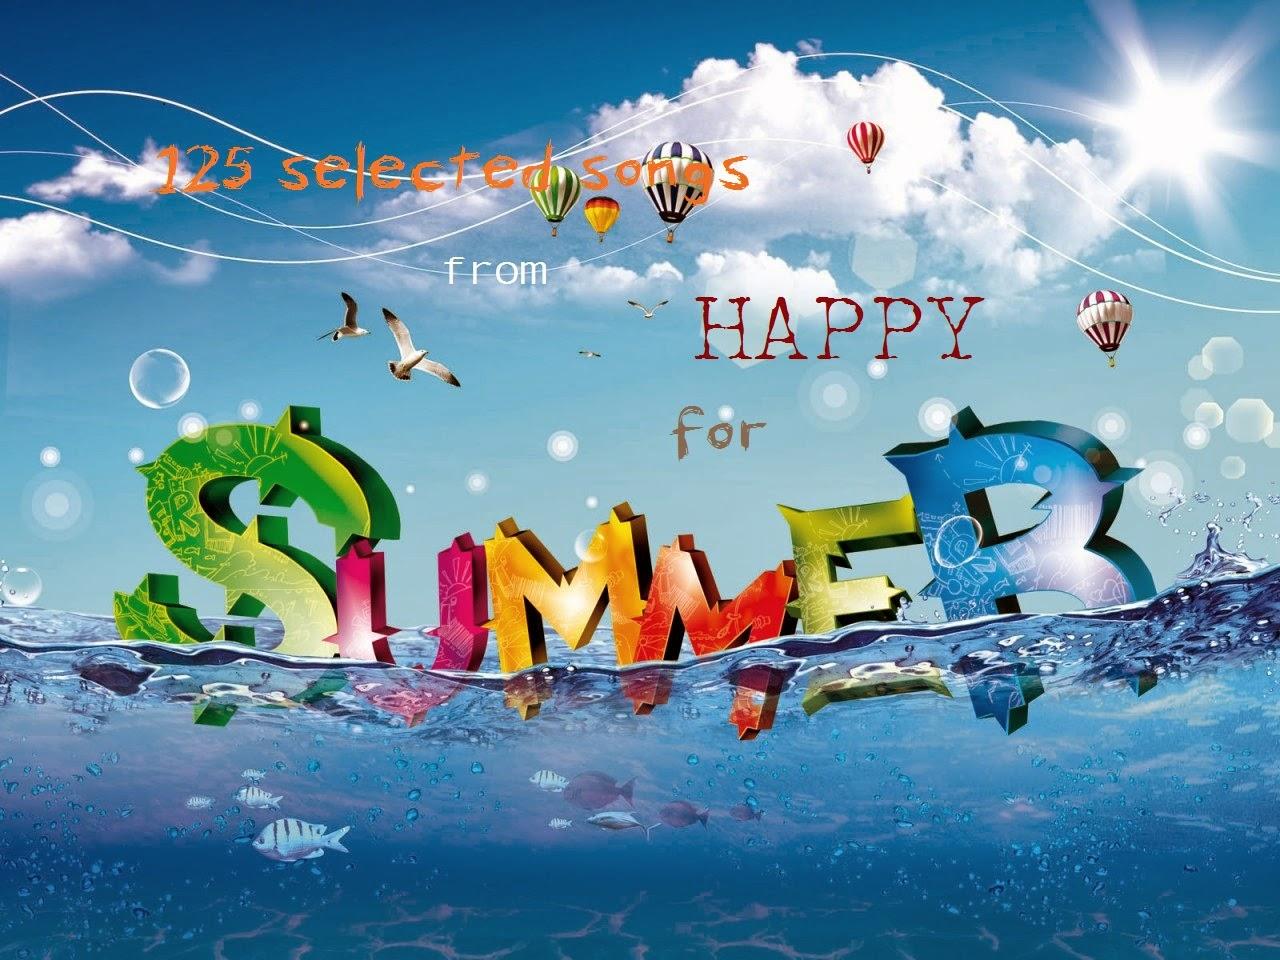 Download [Mp3]-[Summer Song] รวม 125 เพลงไทยคัดมาอย่างเพราะต้อนรับฤดูร้อน : 125 selected songs from Happy for Summer [Shared] 4shared By Pleng-mun.com